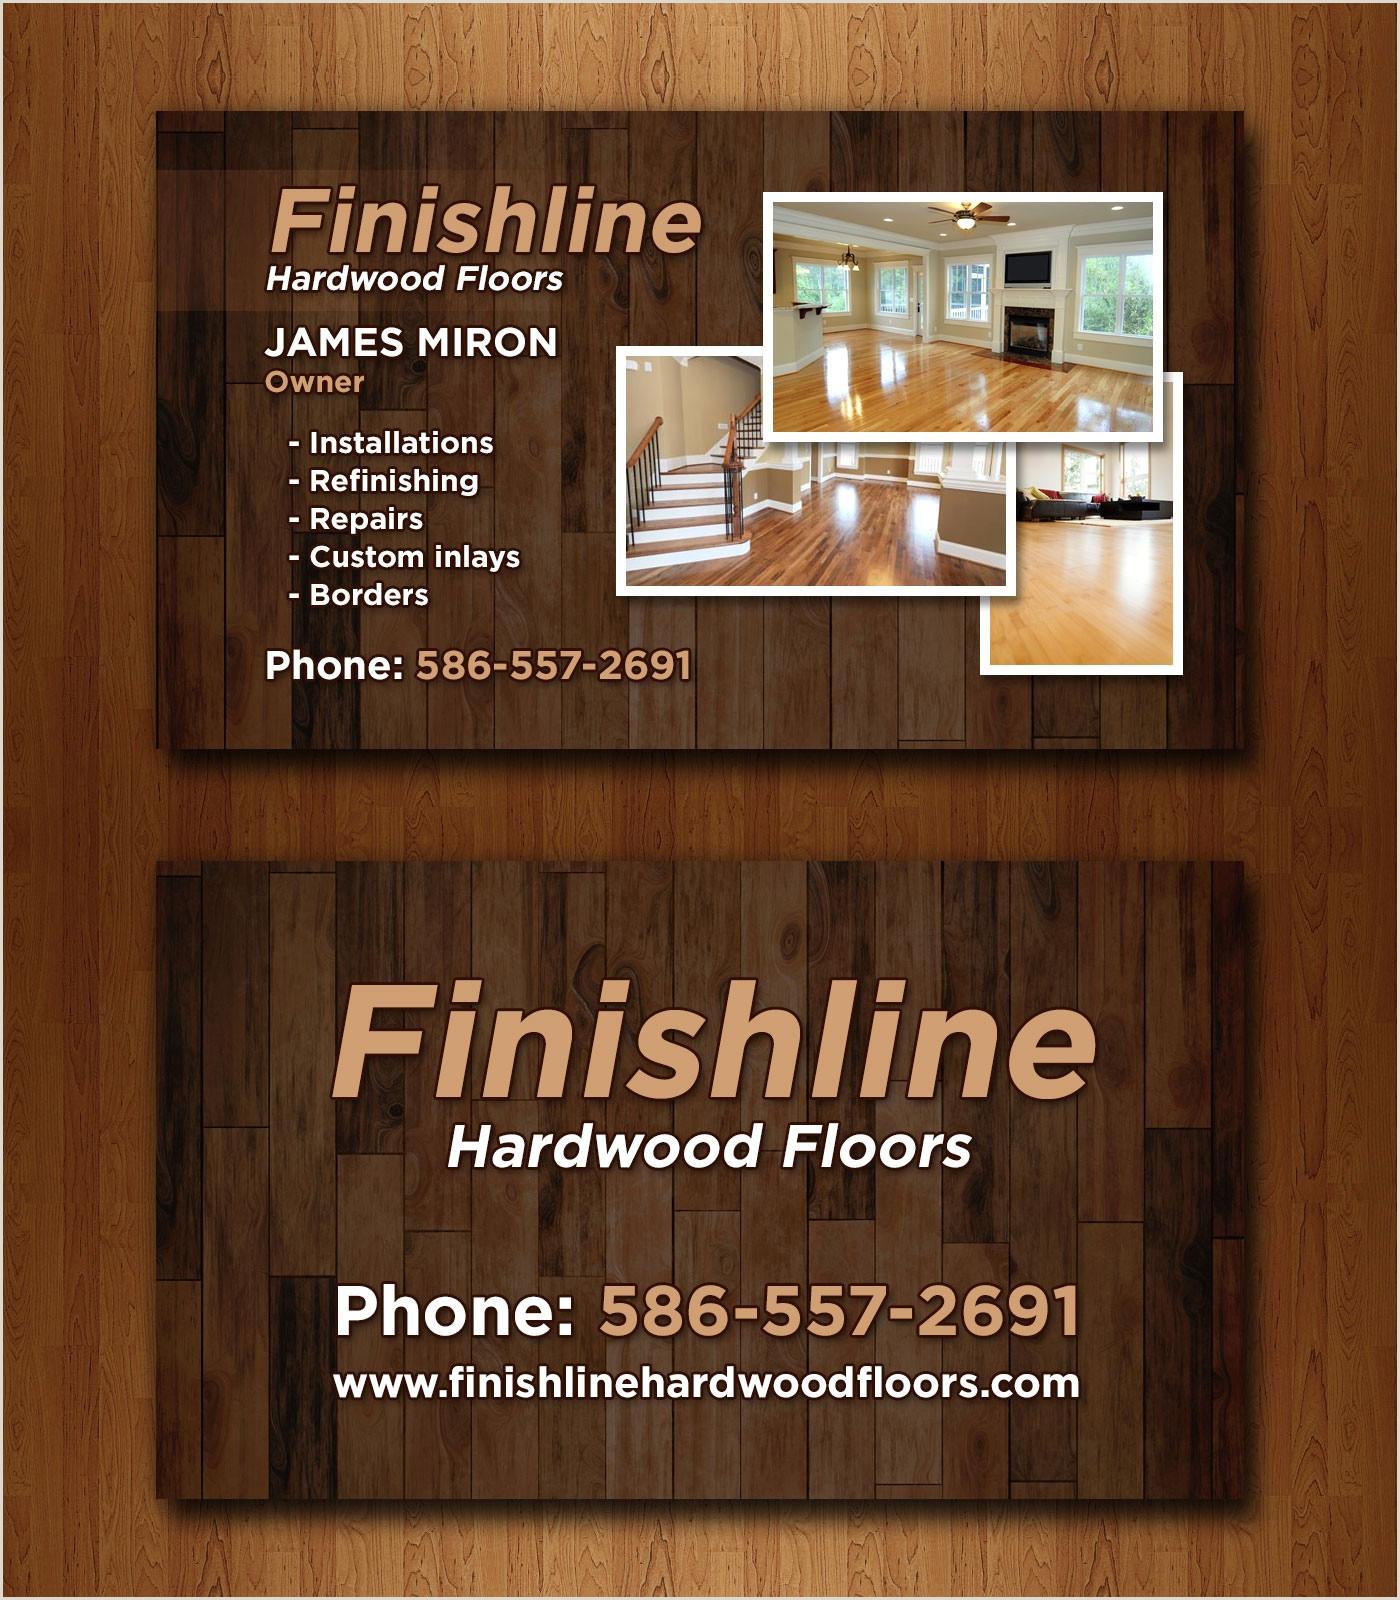 Interior Design Business Cards Templates Free 14 Popular Hardwood Flooring Business Card Template